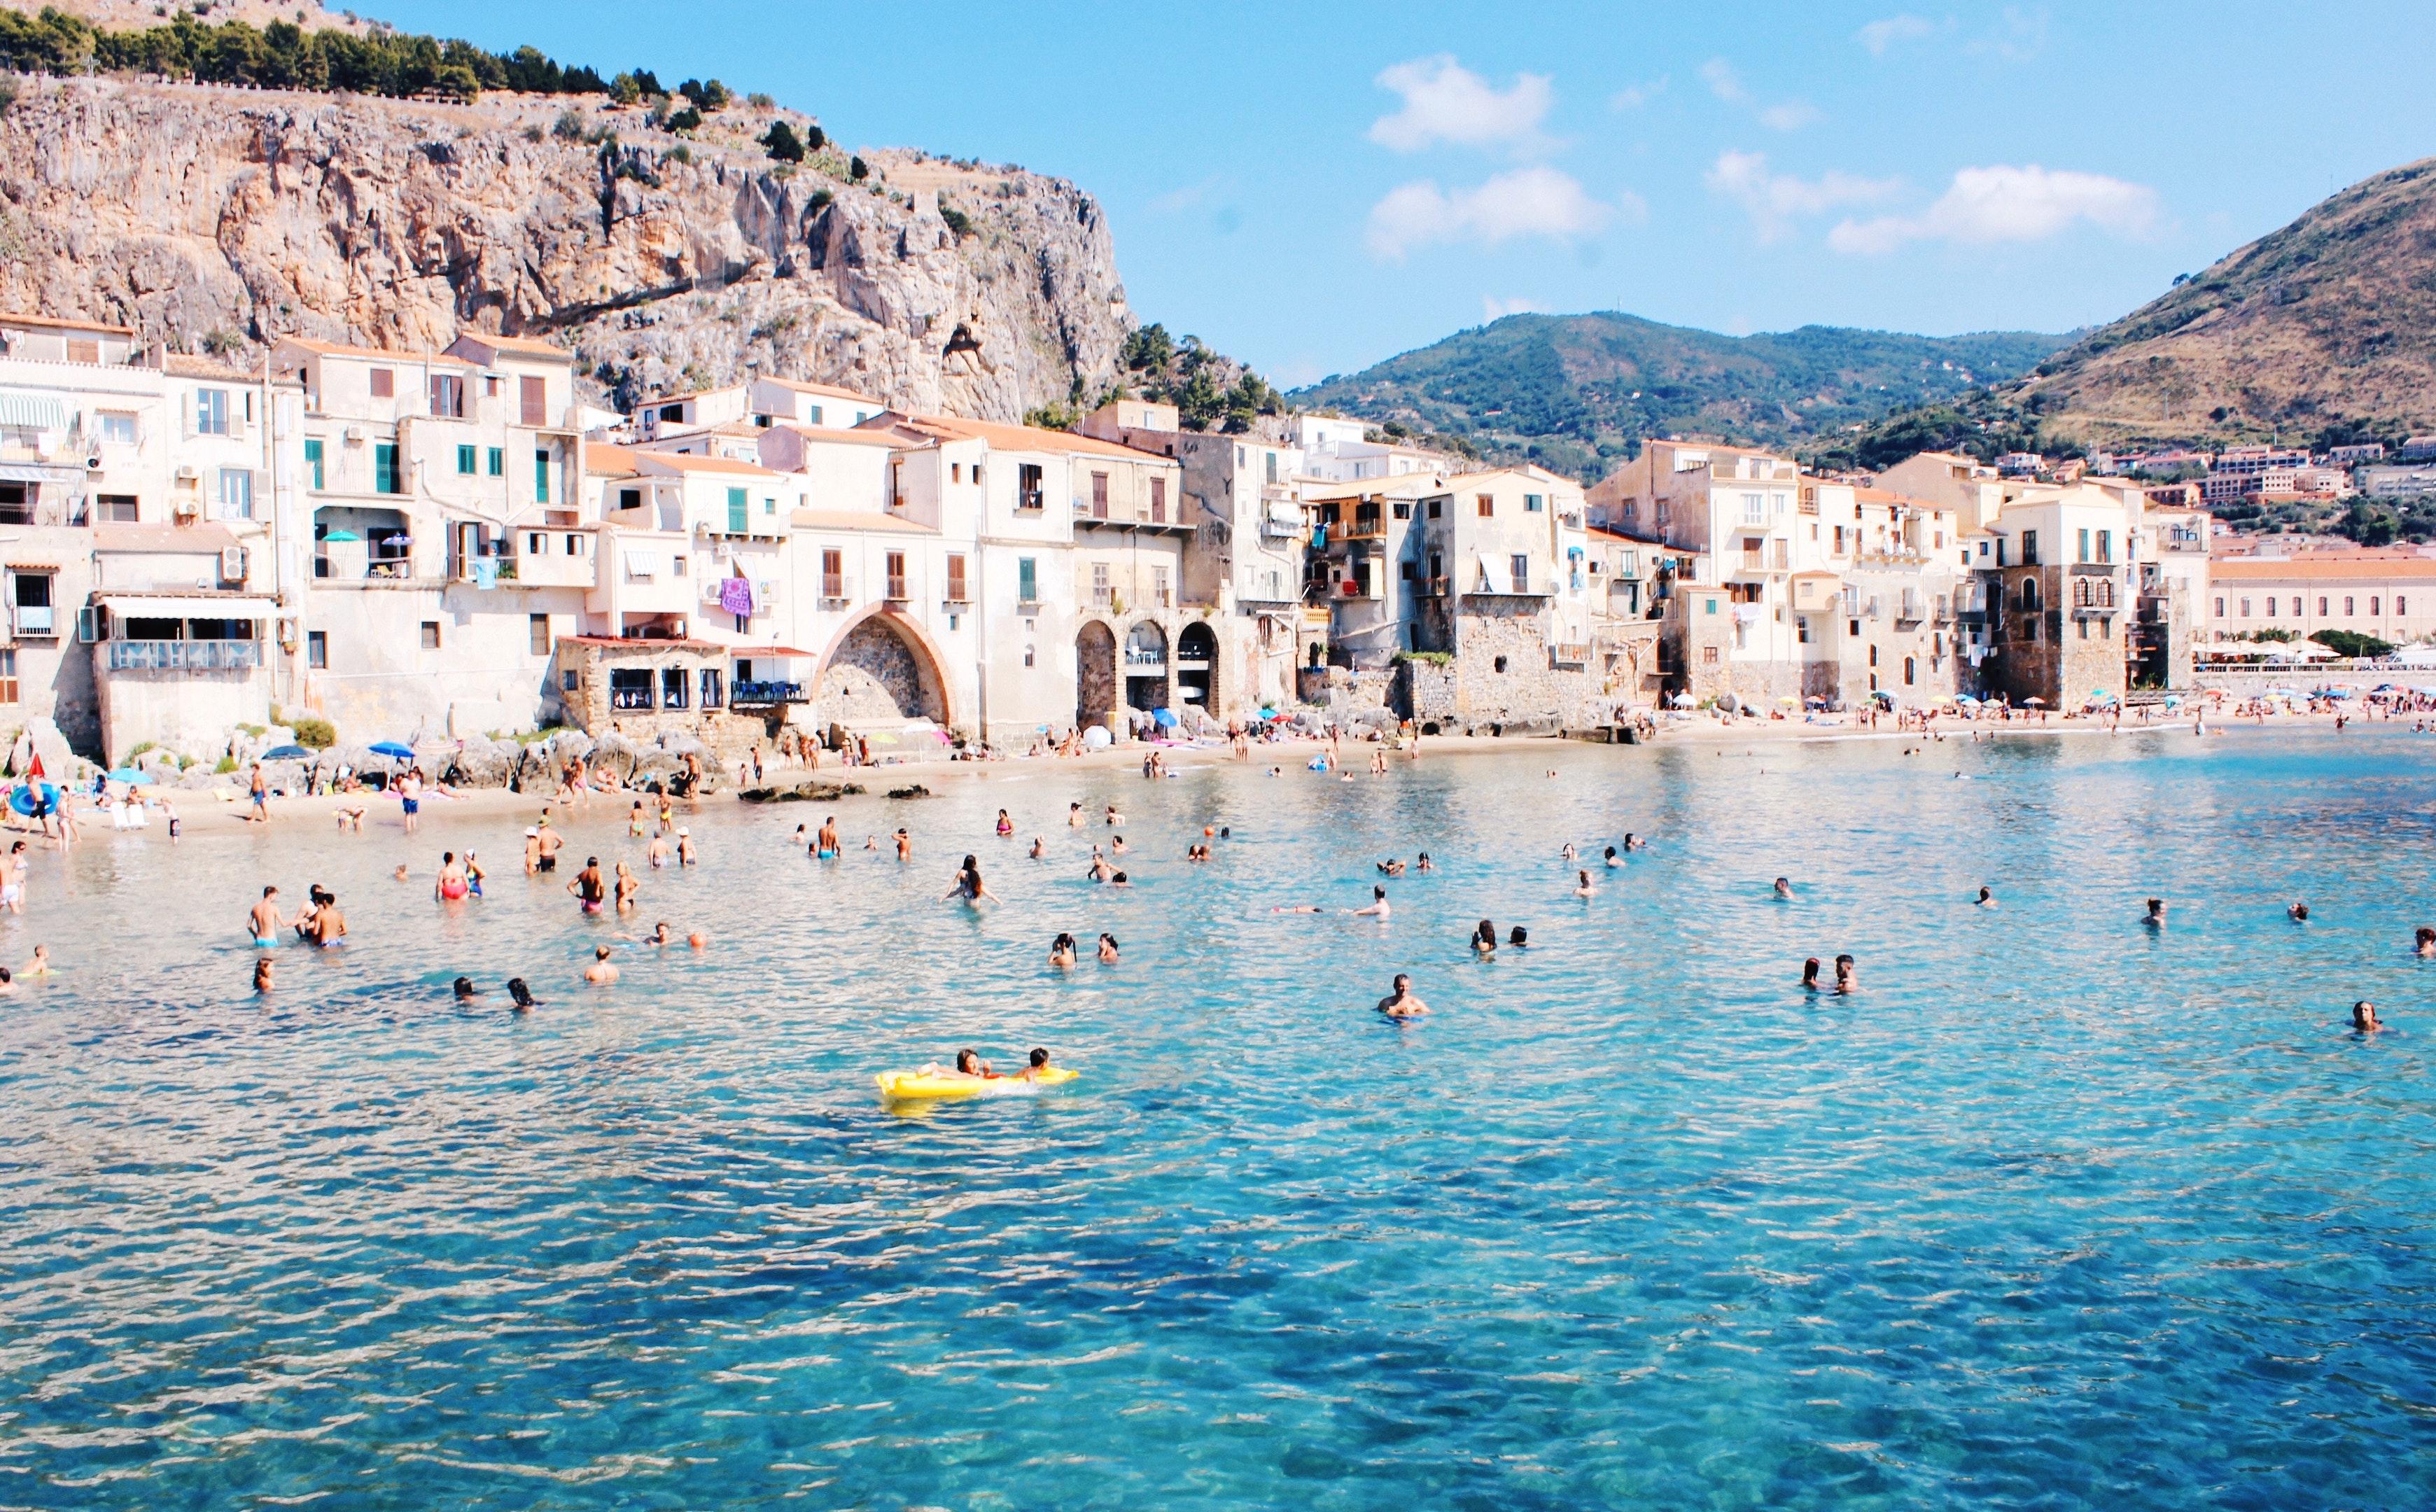 Appartement de vacances Studio in Campofelice di Roccella - 1 km vom Strand entfernt (2489579), Campofelice di Roccella, Palermo, Sicile, Italie, image 10